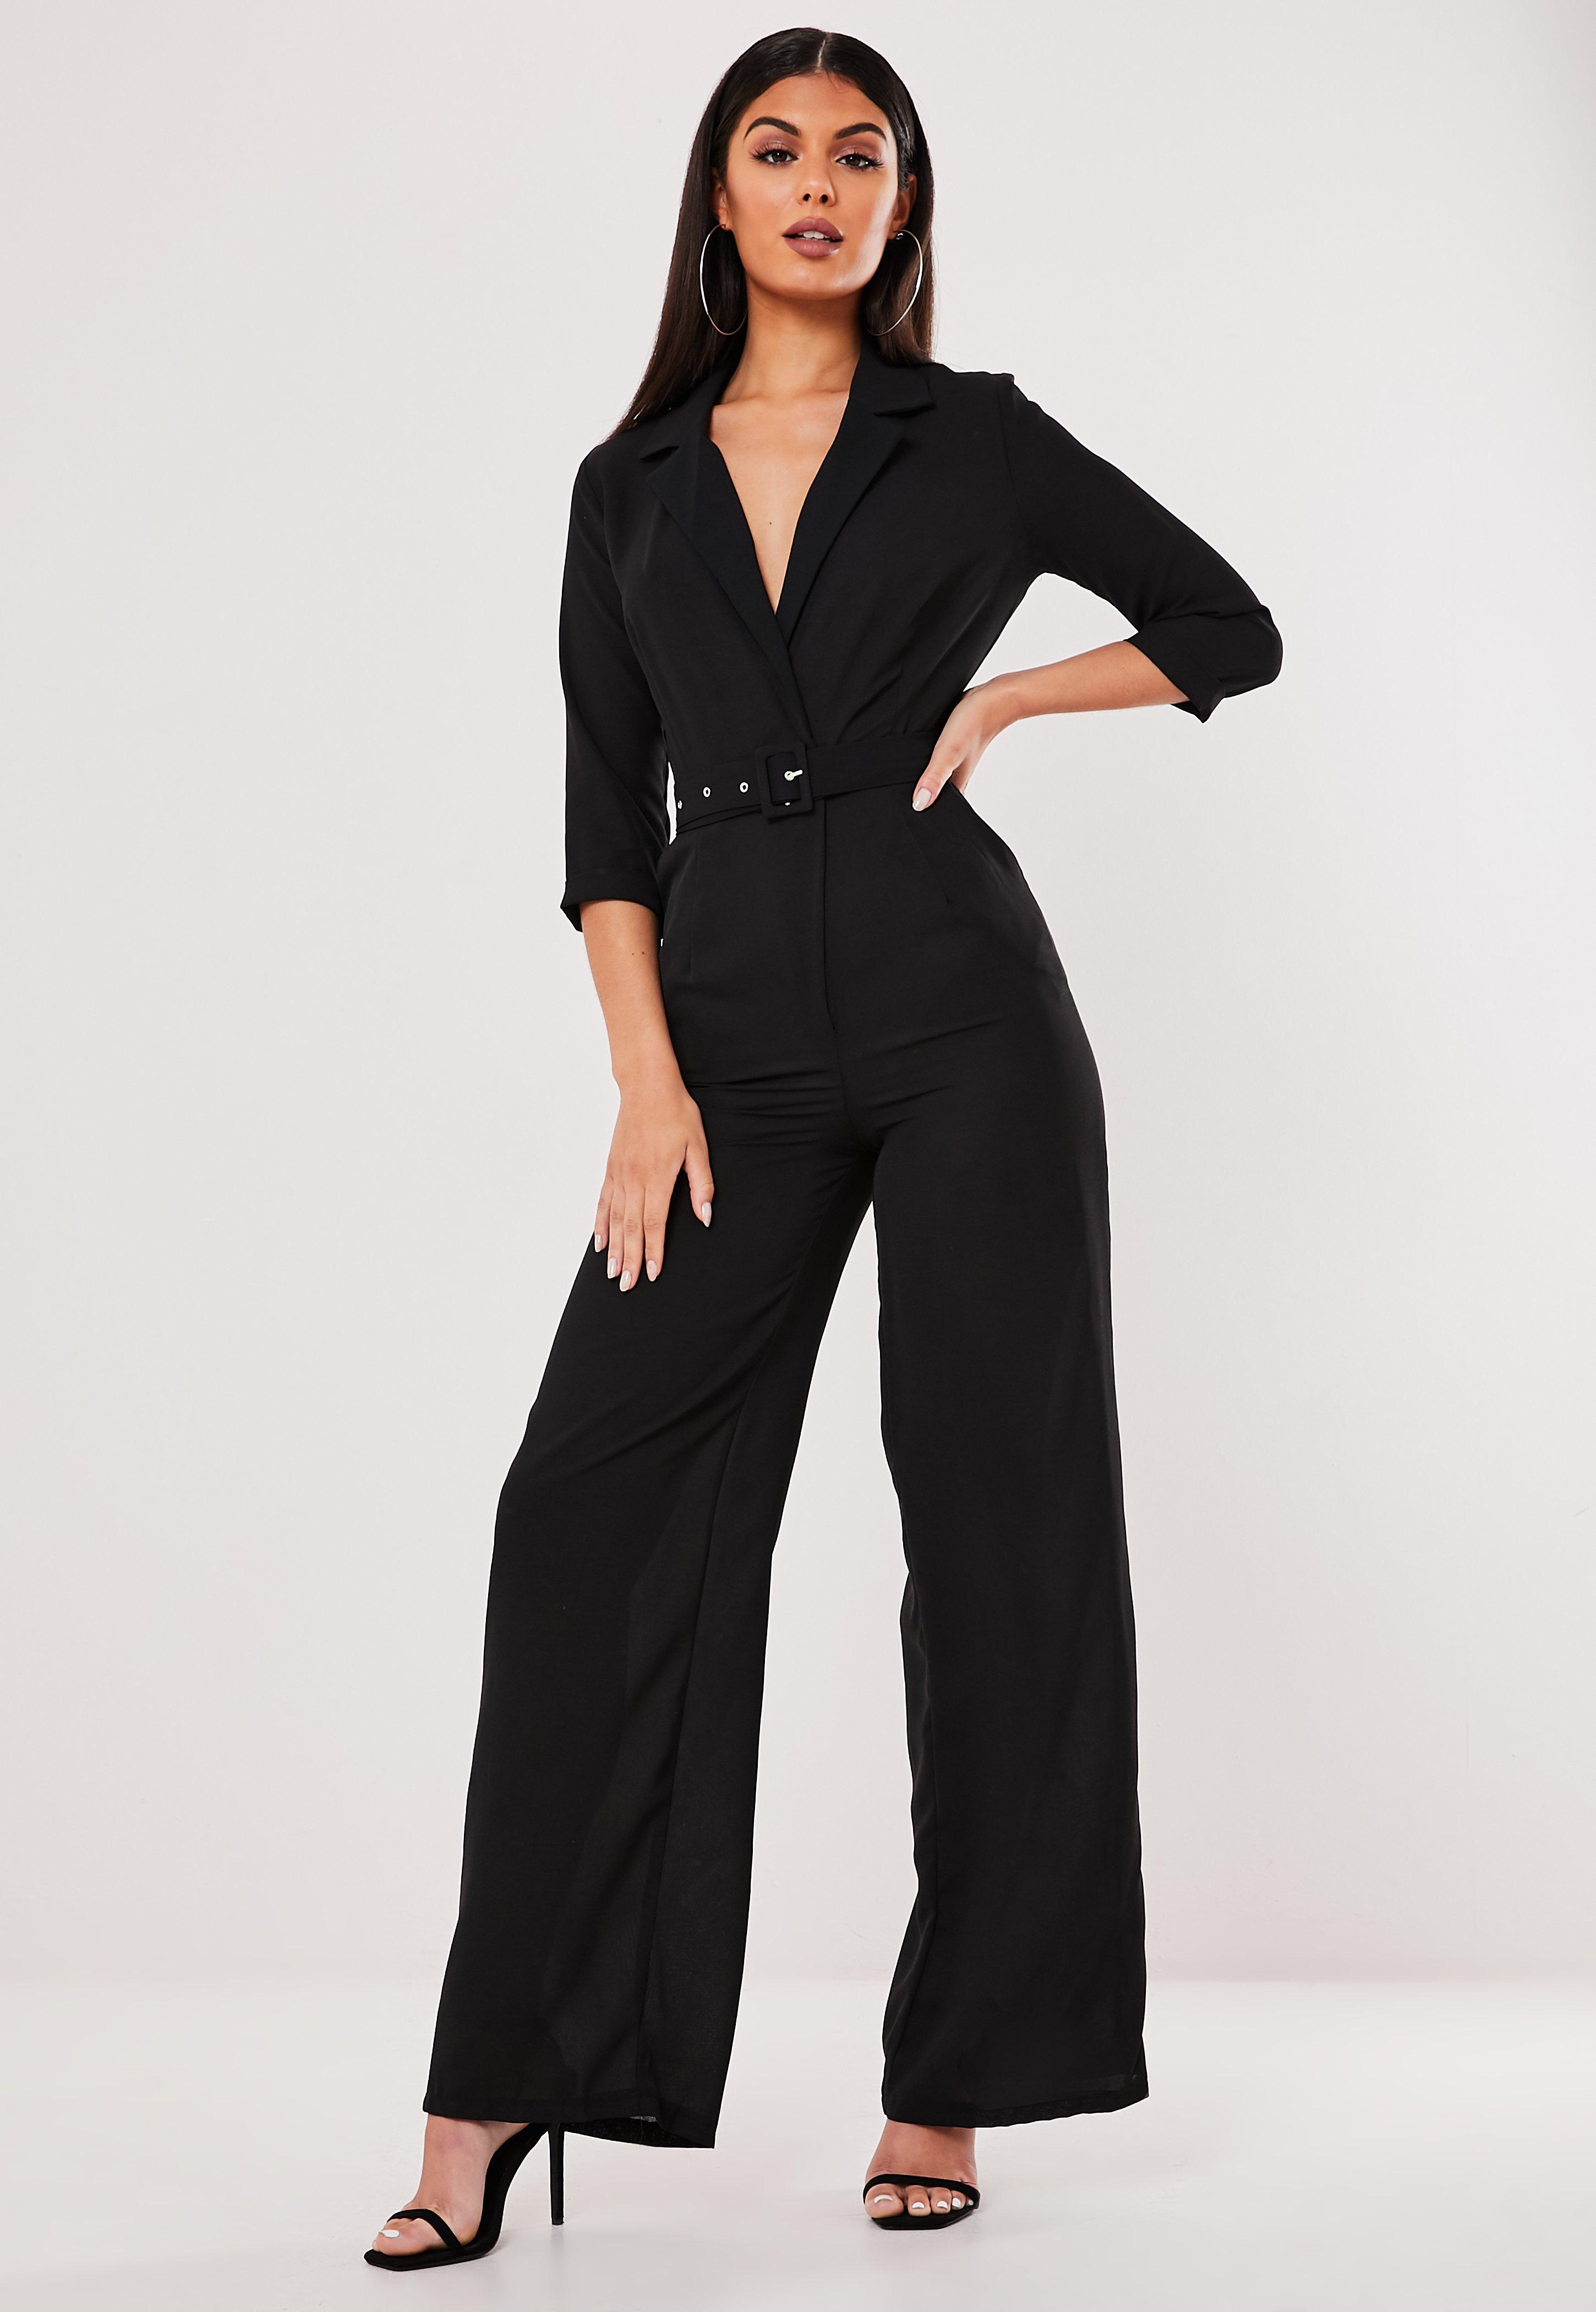 5ea89da74c5 Long Sleeve Jumpsuits - Missguided Australia